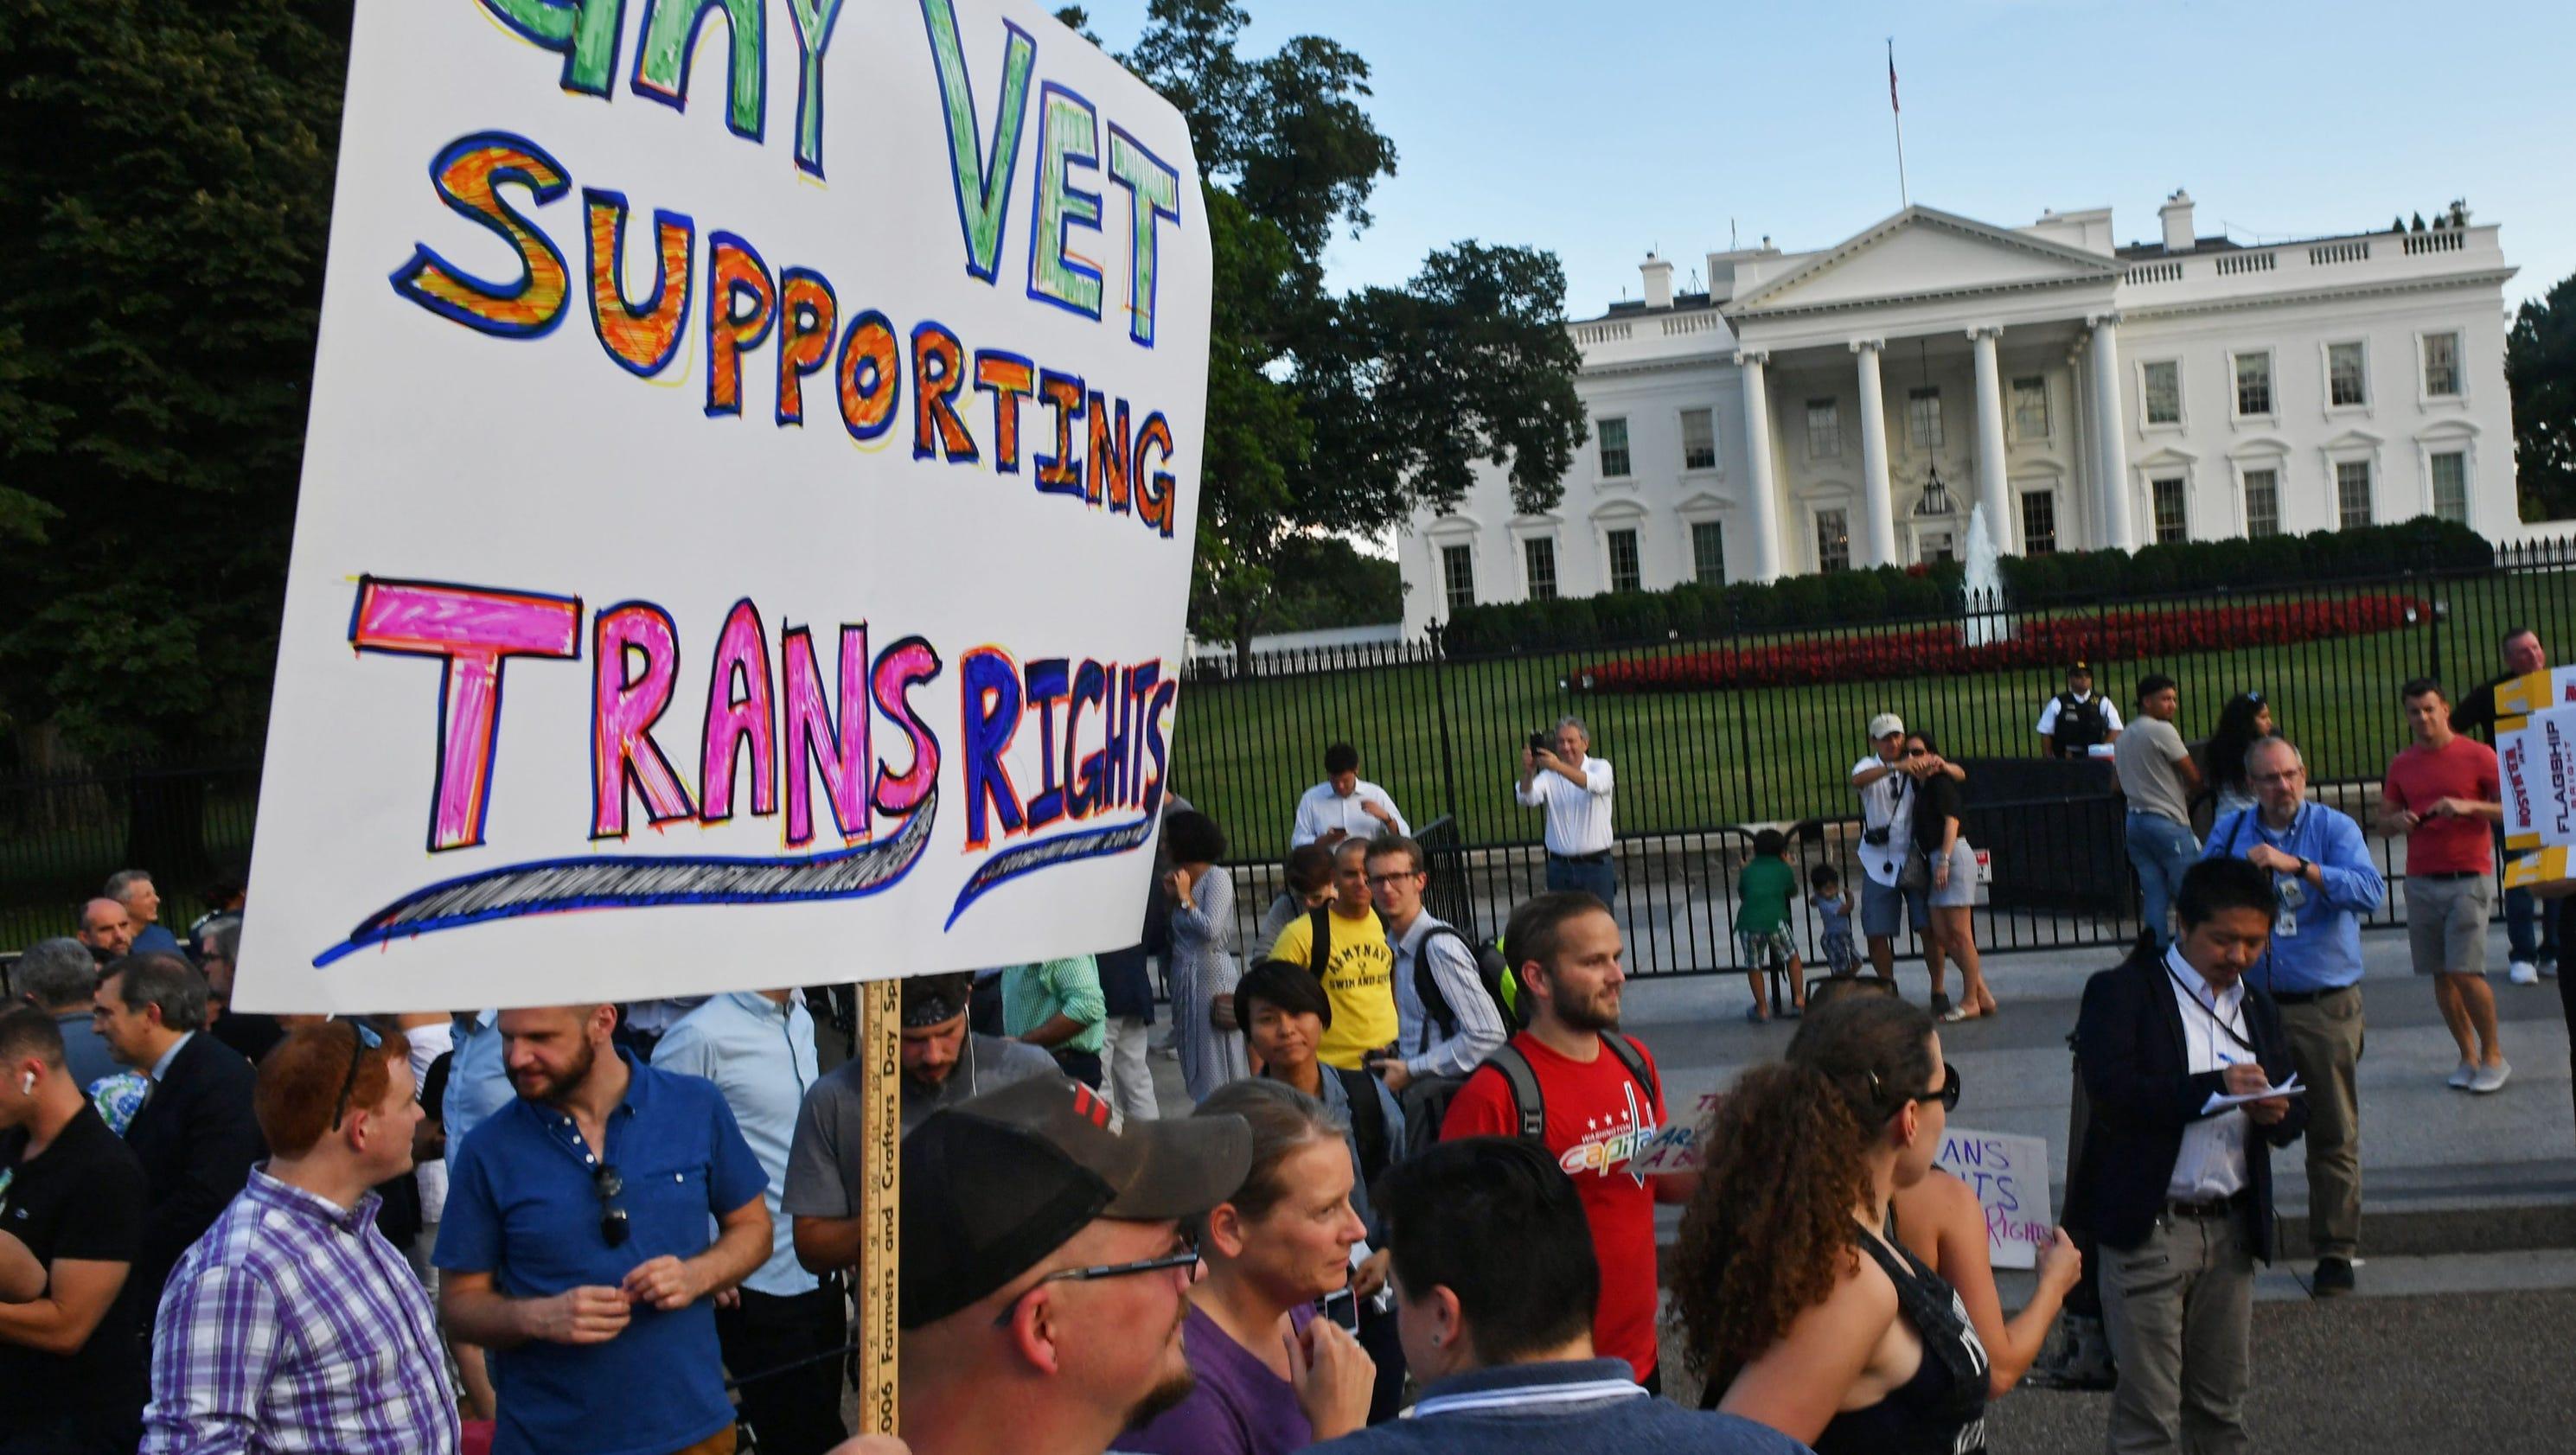 Navy: Transgender sailors can still serve and get medical treatment until further notice